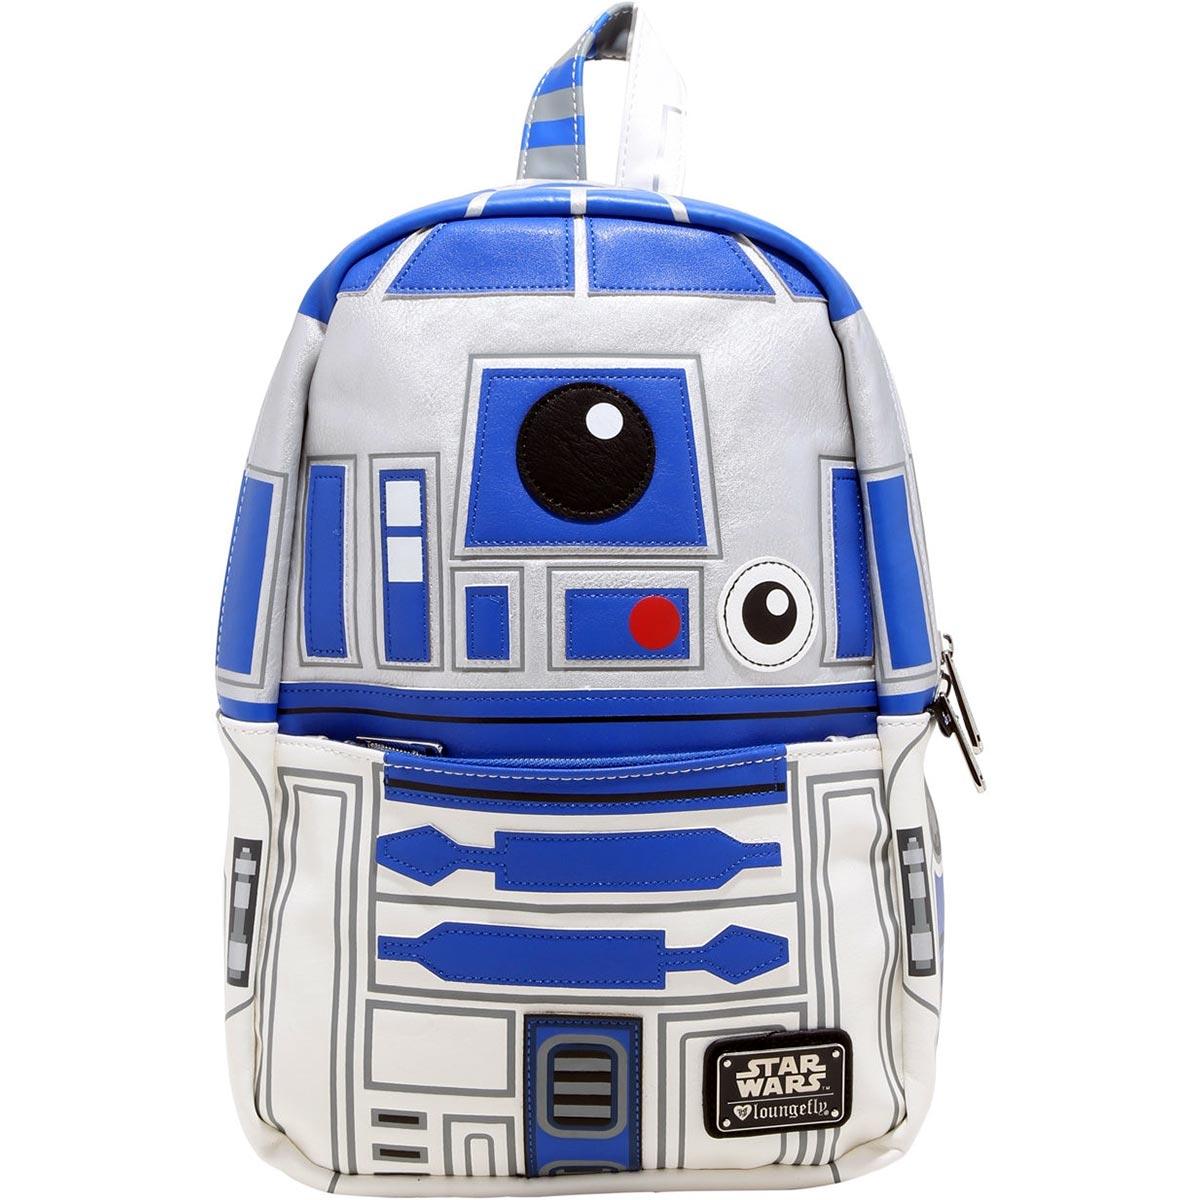 e7d753267962 Star Wars R2-D2 Mini Droid Backpack